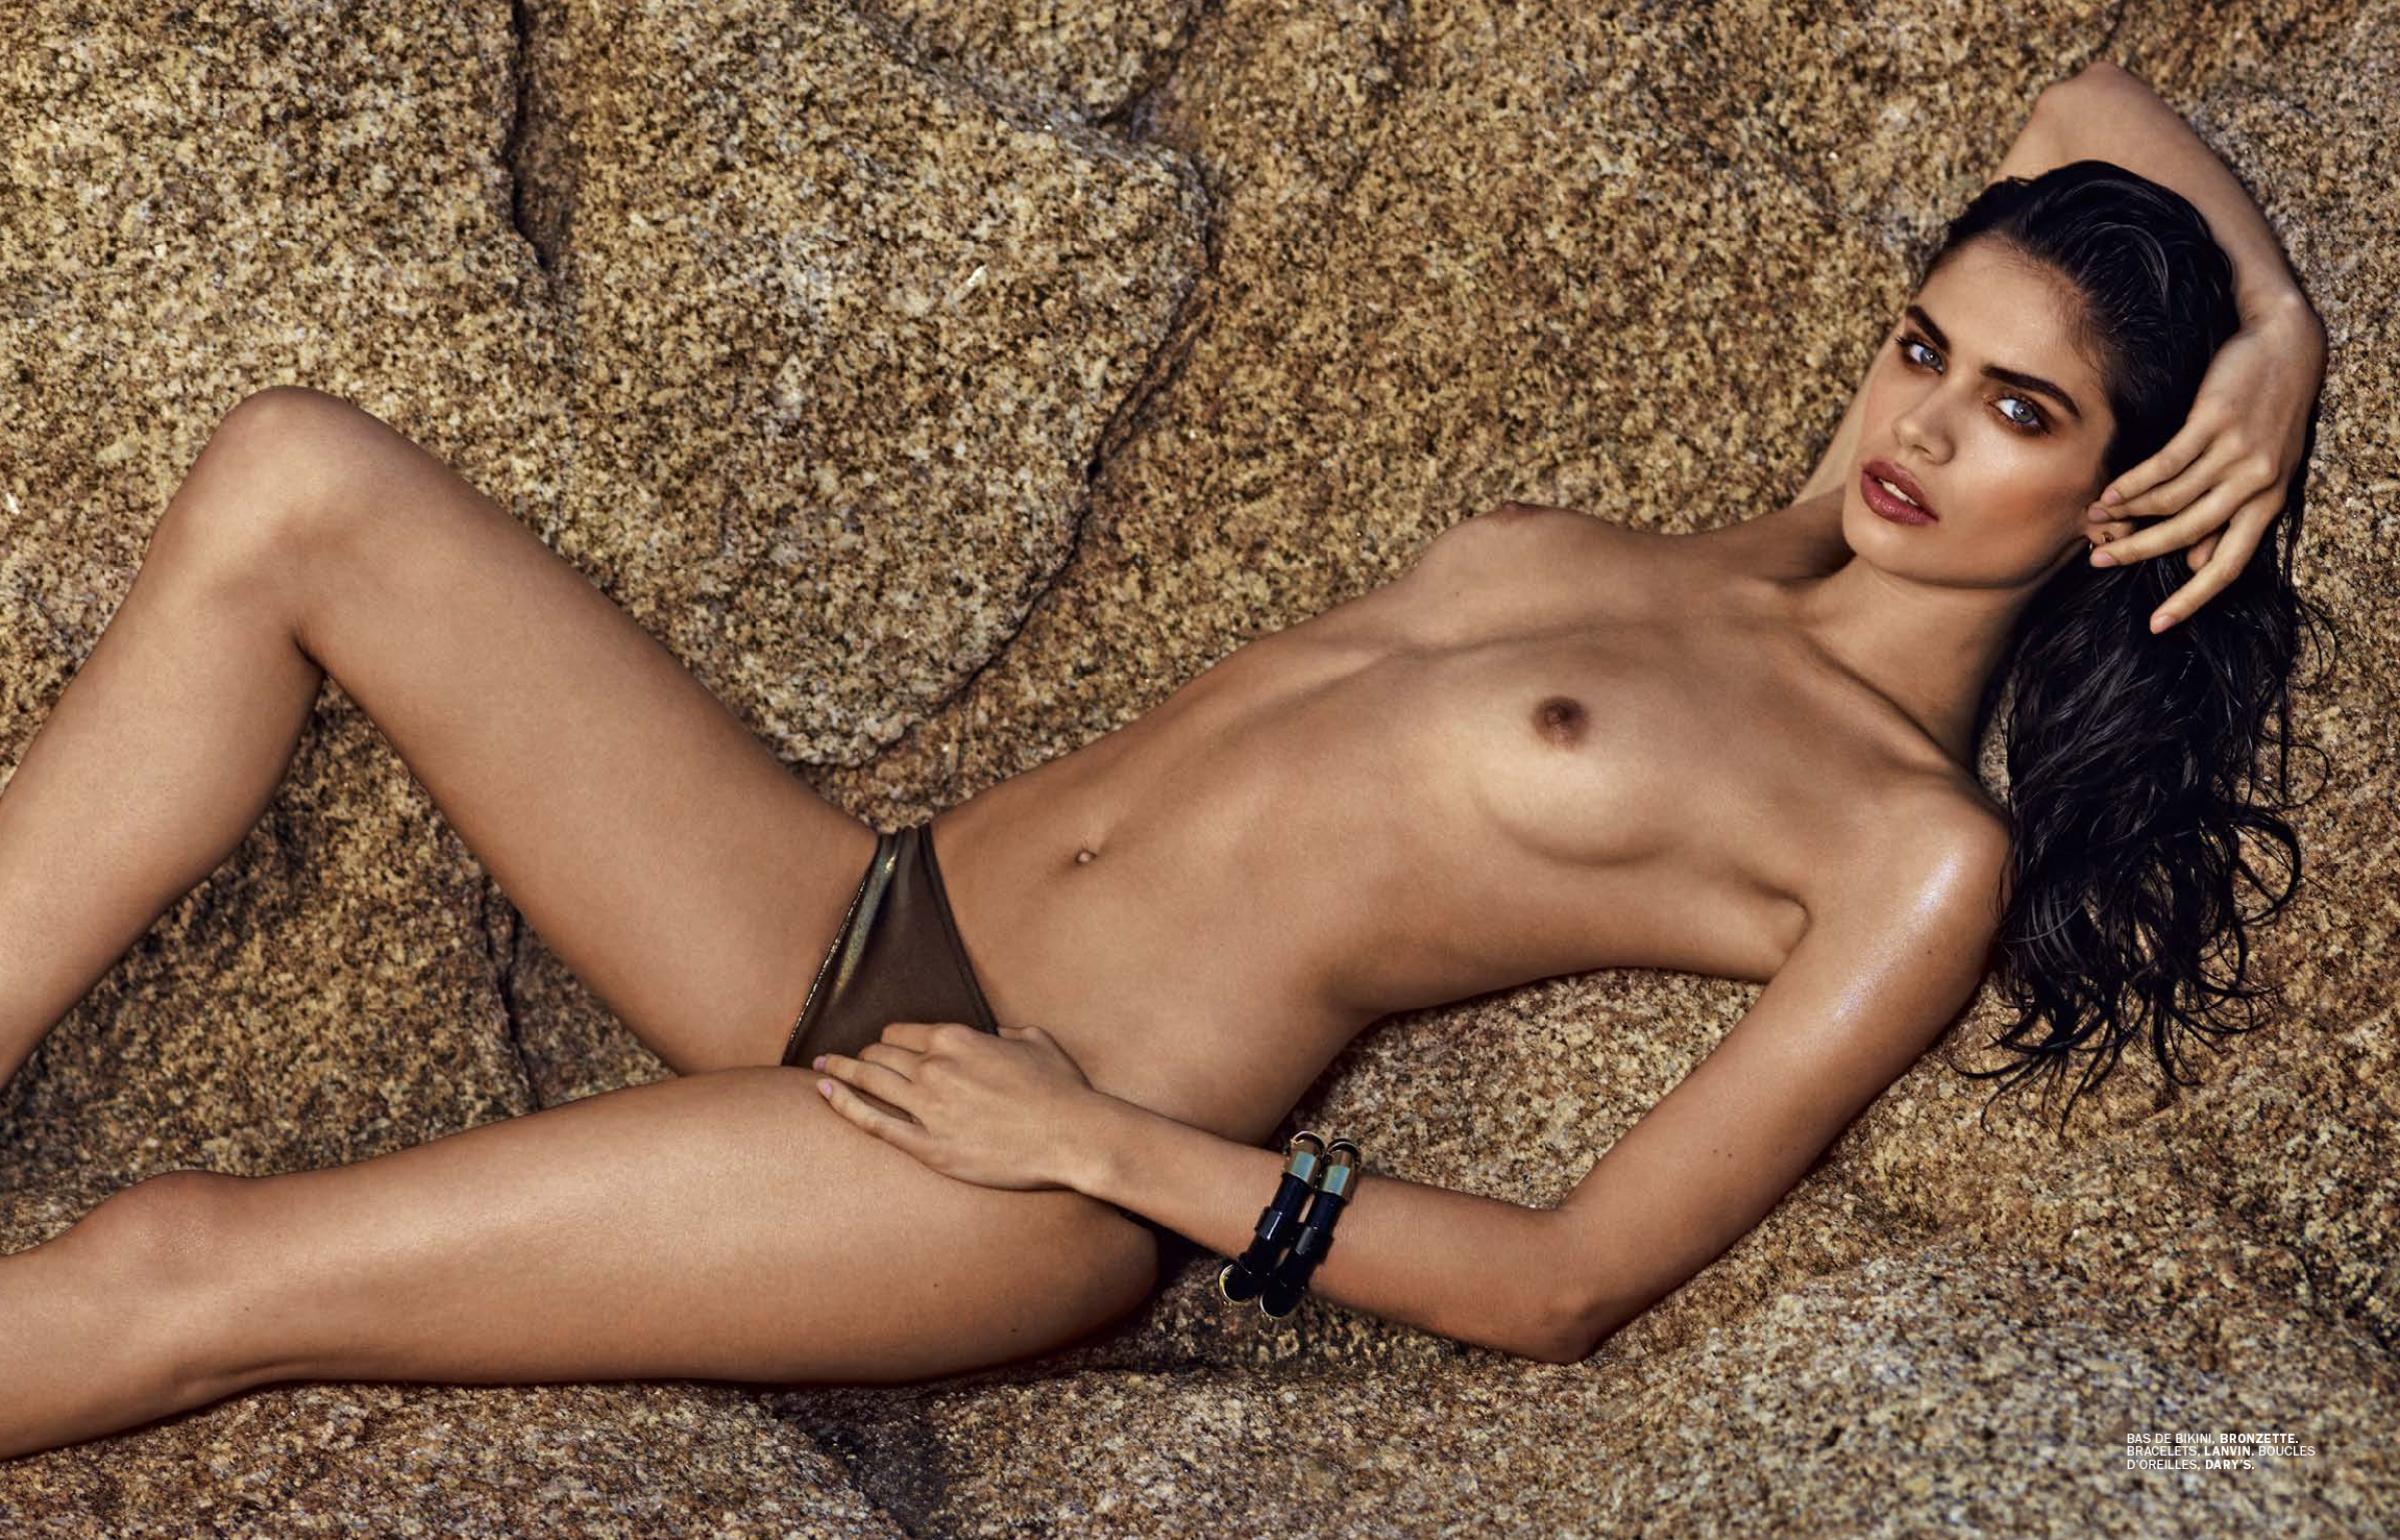 underwear Porno Sara Sampaio naked photo 2017